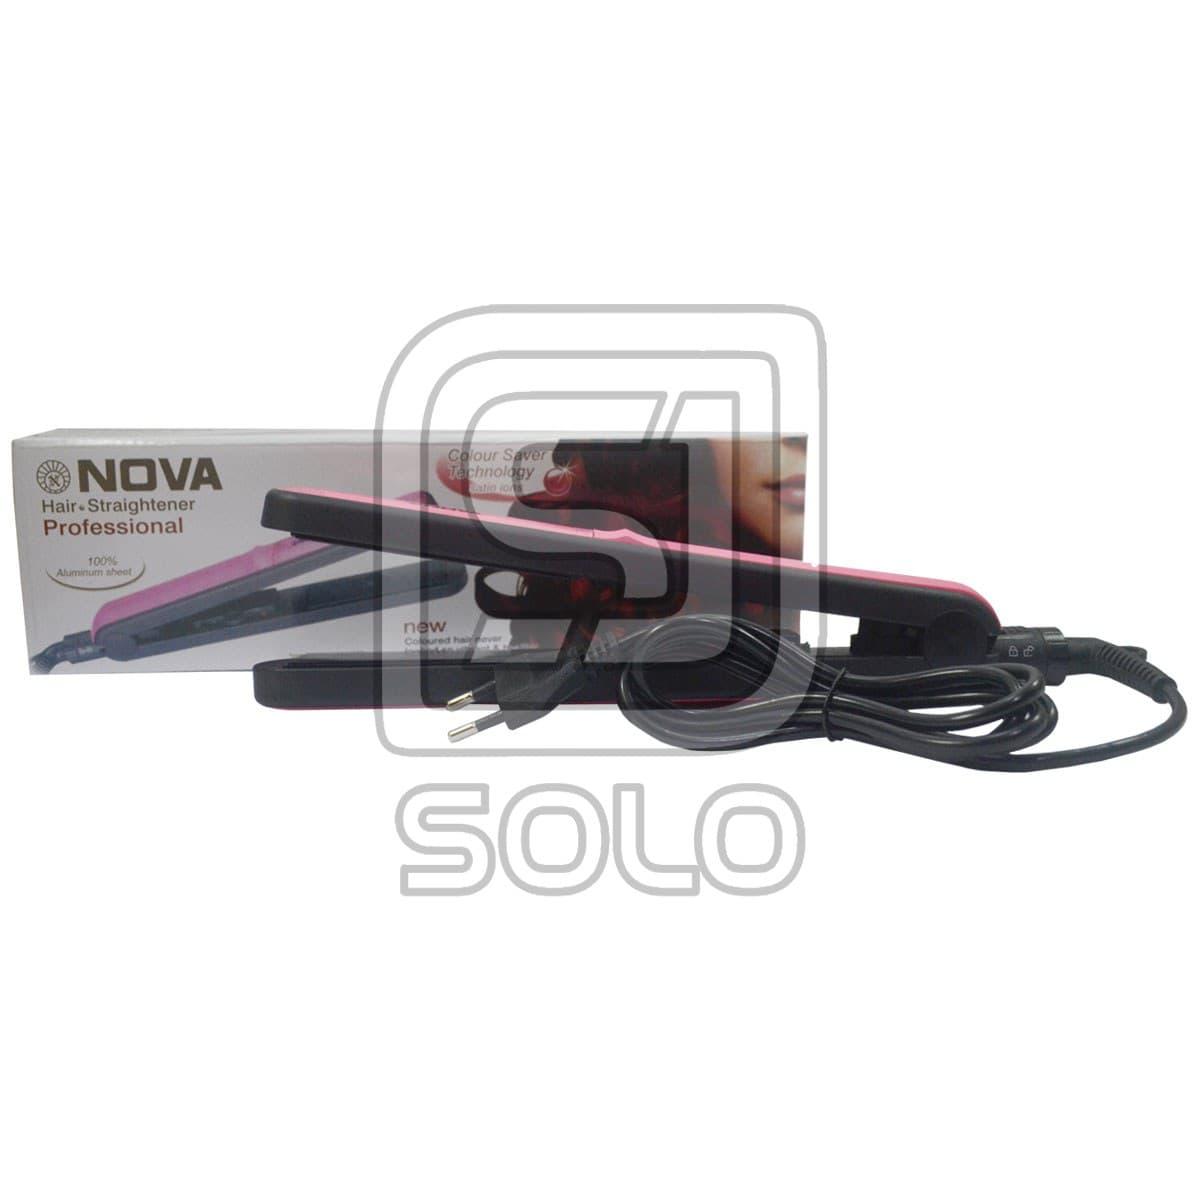 Jual Produk Sjsolo Online Termurah Catokan 3in1 Nhc 8890 Catok Rambut Nova 817crm Alat